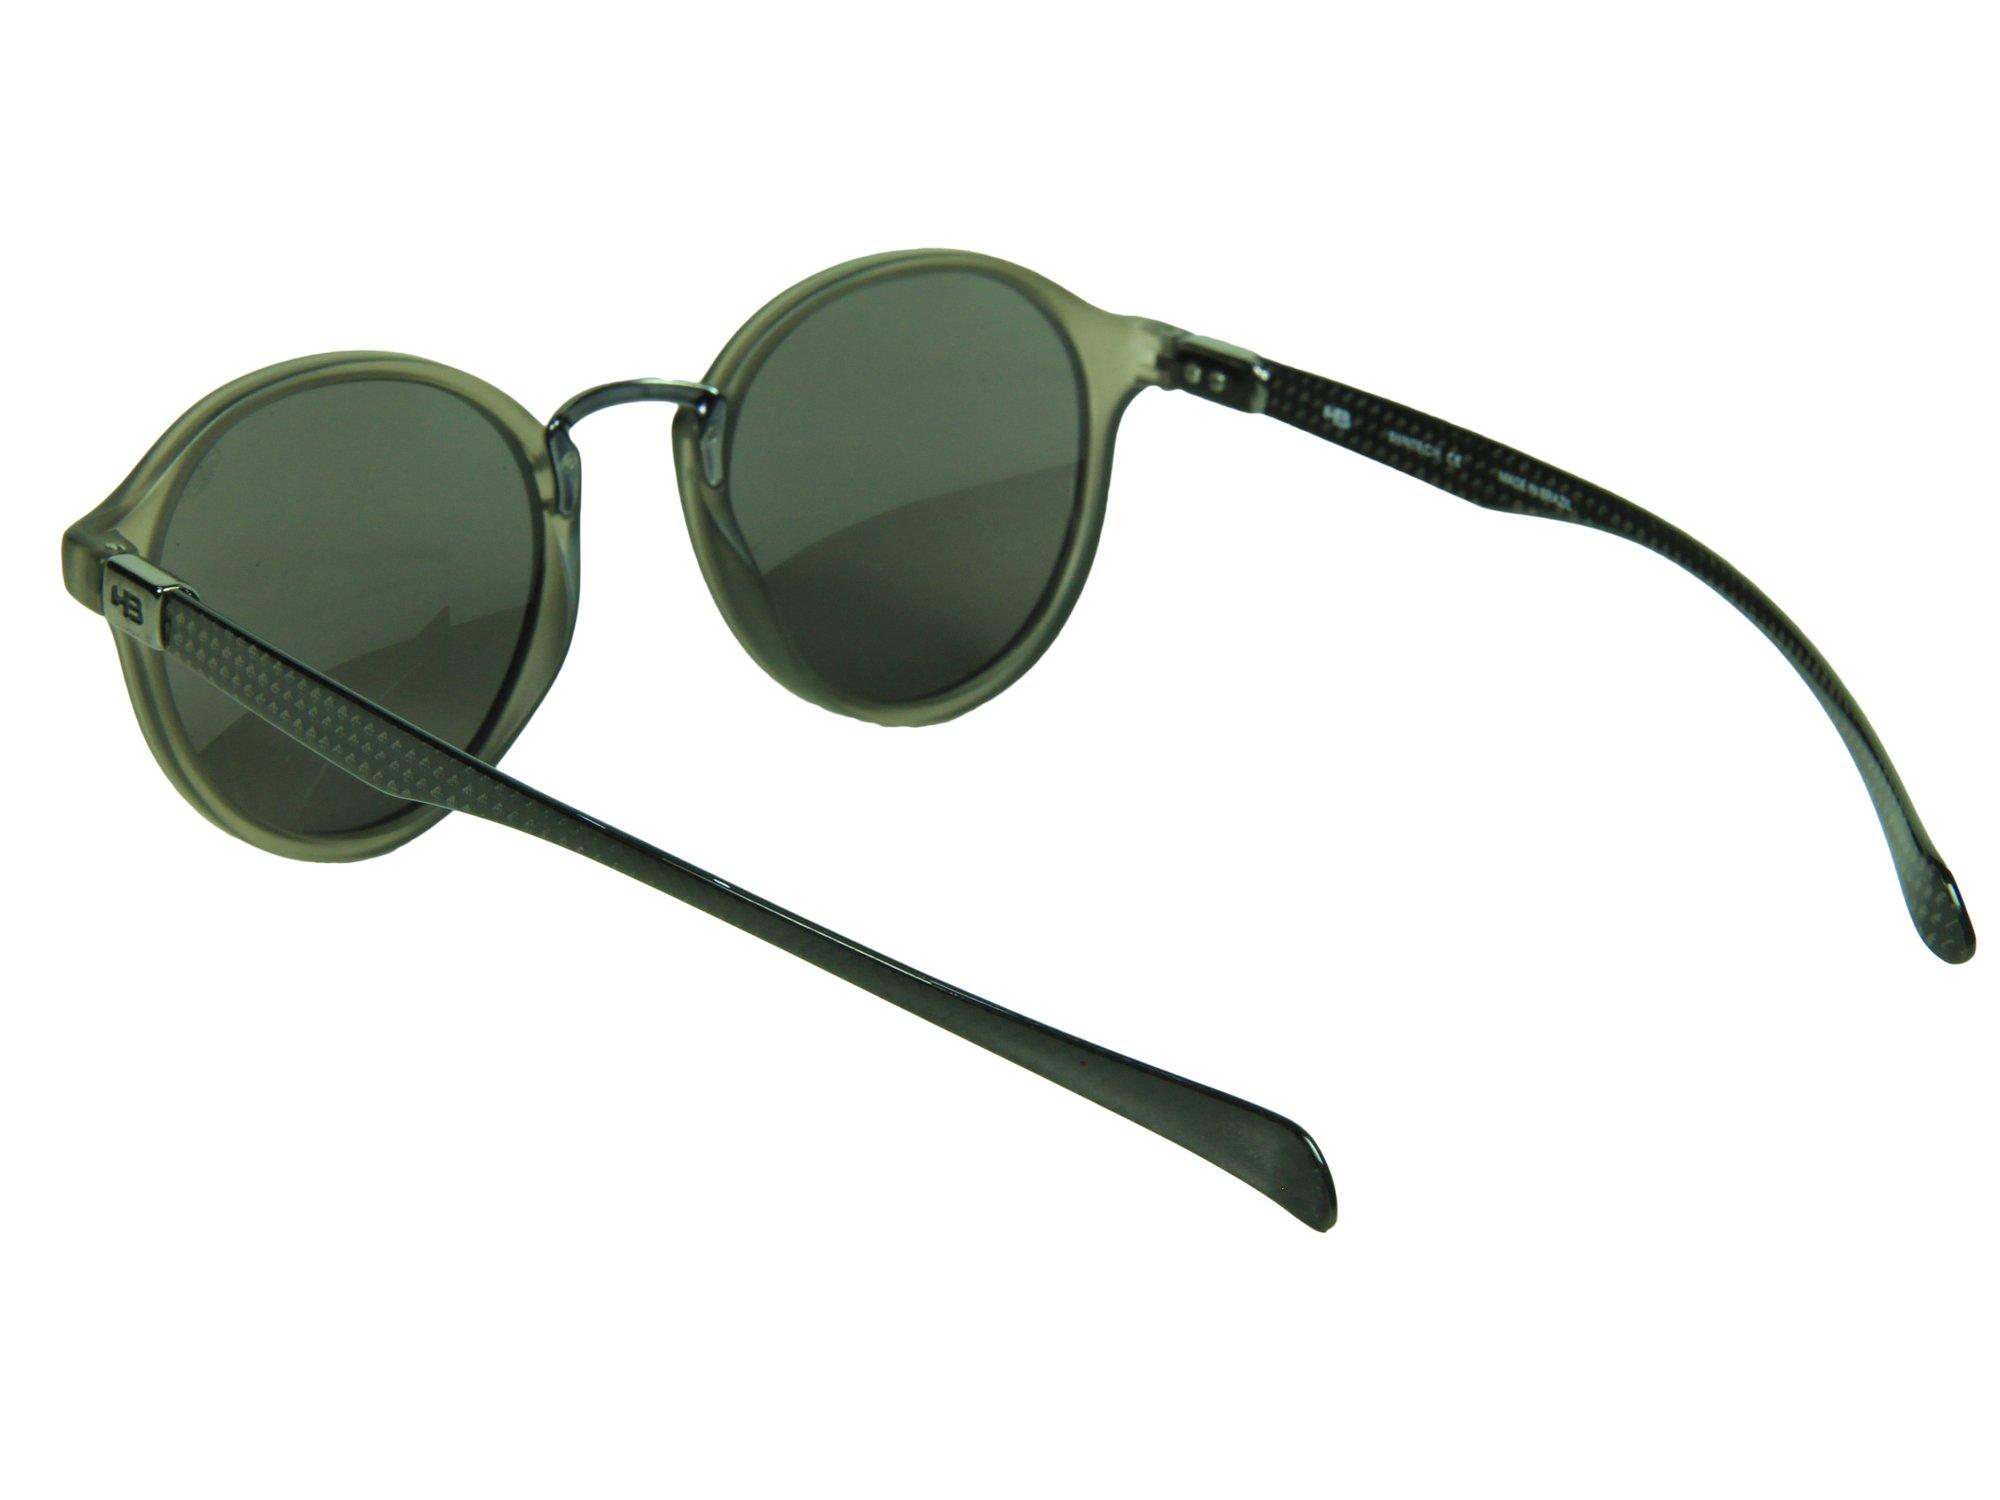 Óculos de Sol HB Brighton Silver Lenses - Carbon Onix - Session Store 41dda5f806